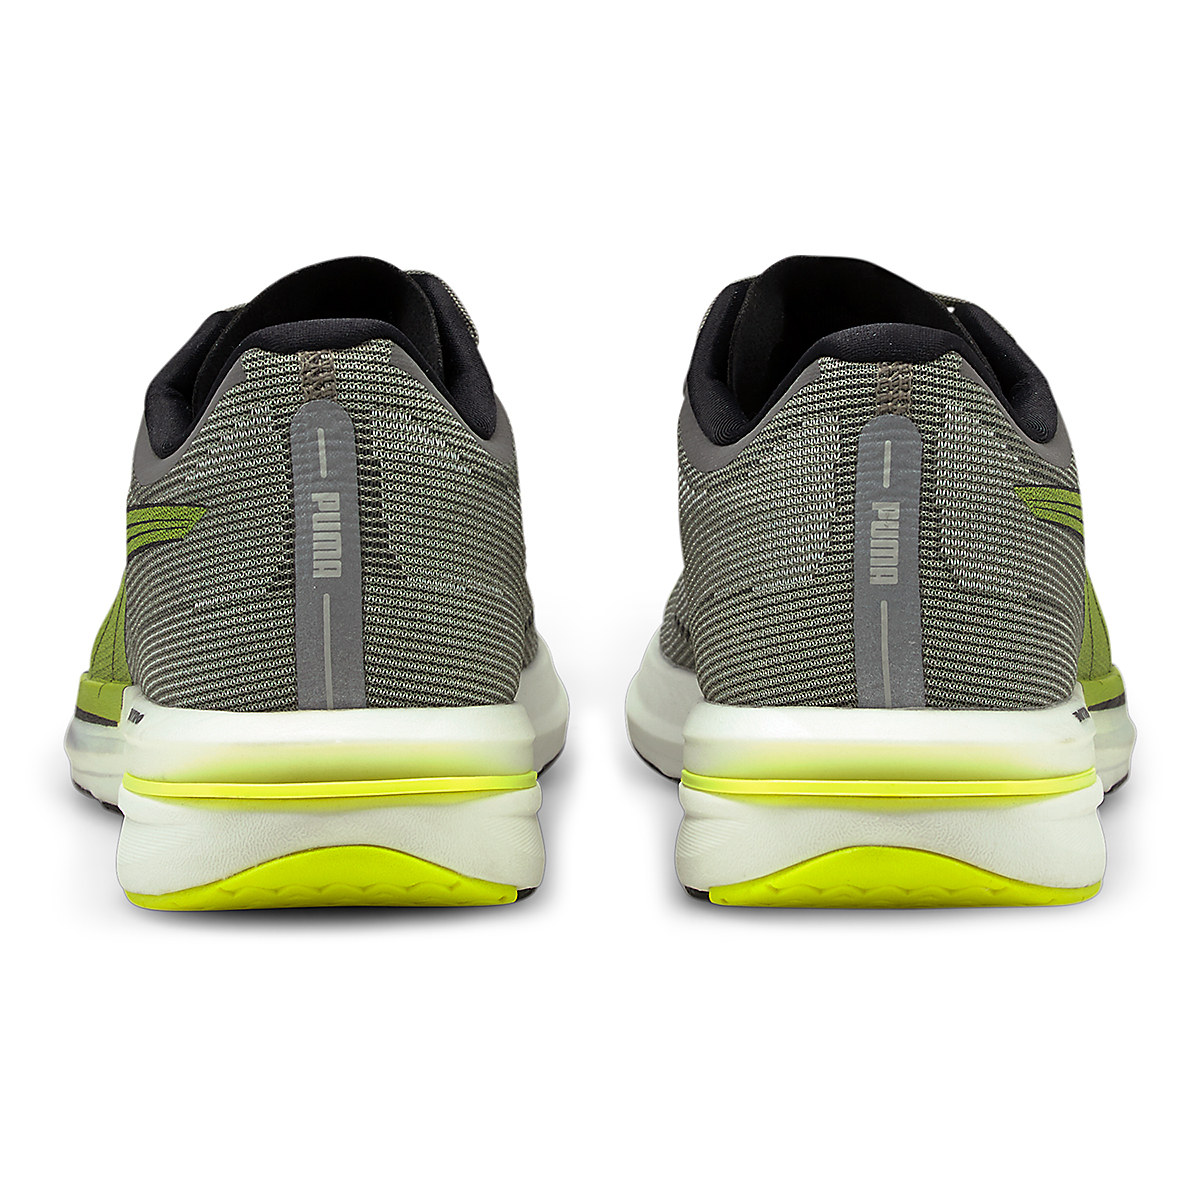 Men's Puma Velocity Nitro Running Shoe - Color: Castlerock-Yellow Alert-Puma Black - Size: 7 - Width: Regular, Castlerock-Yellow Alert-Puma Black, large, image 3